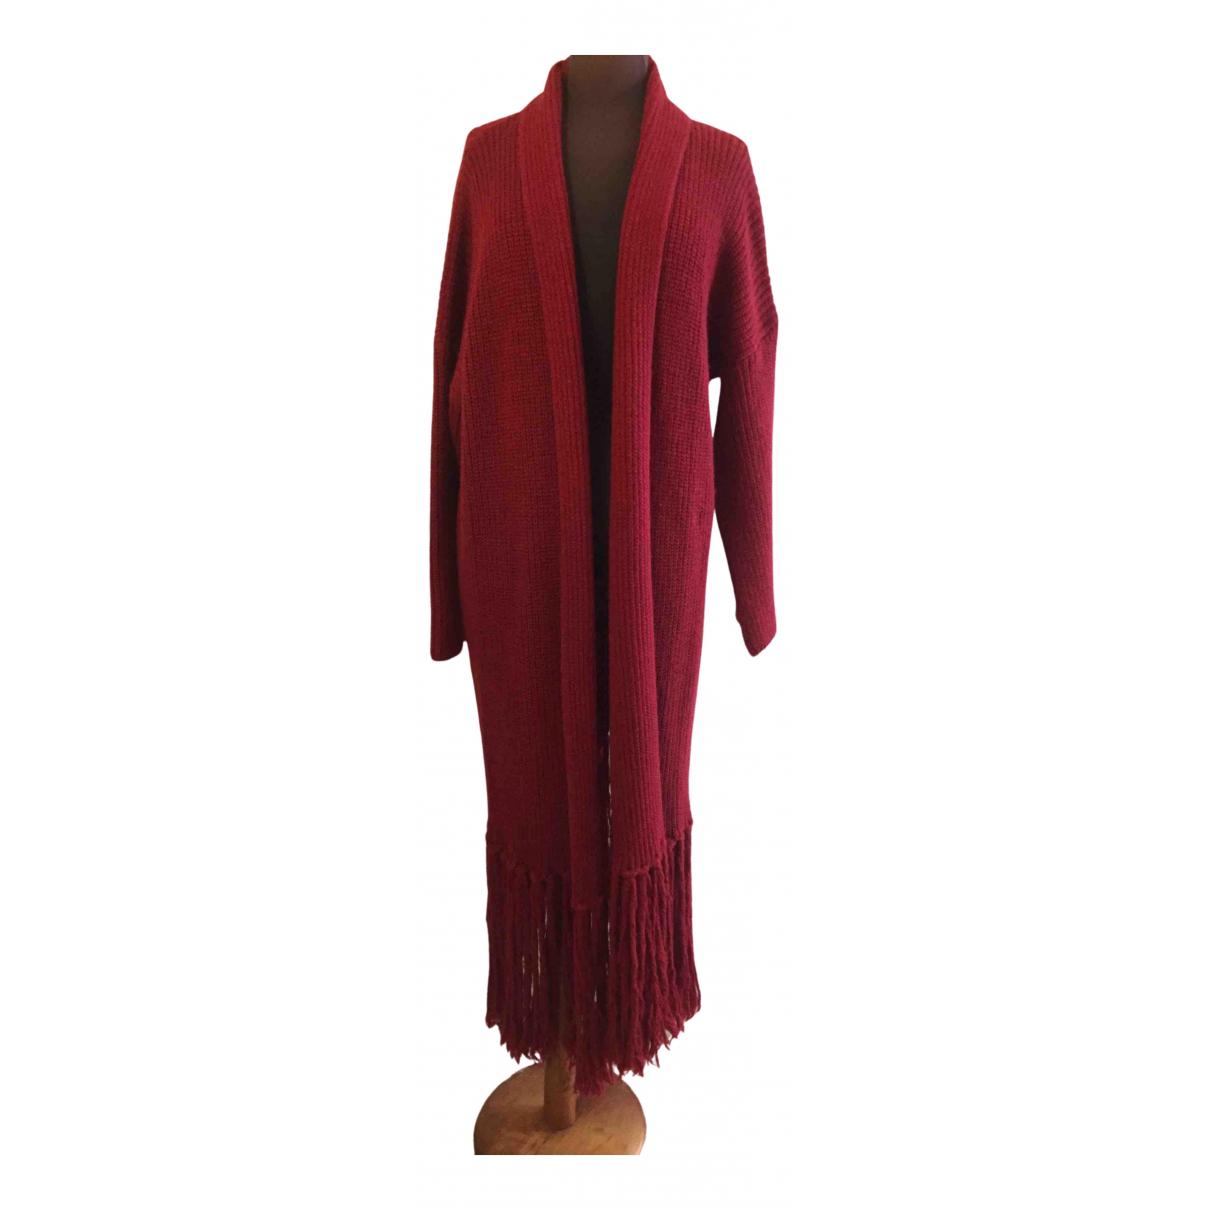 Vicolo \N Burgundy Wool coat for Women One Size International